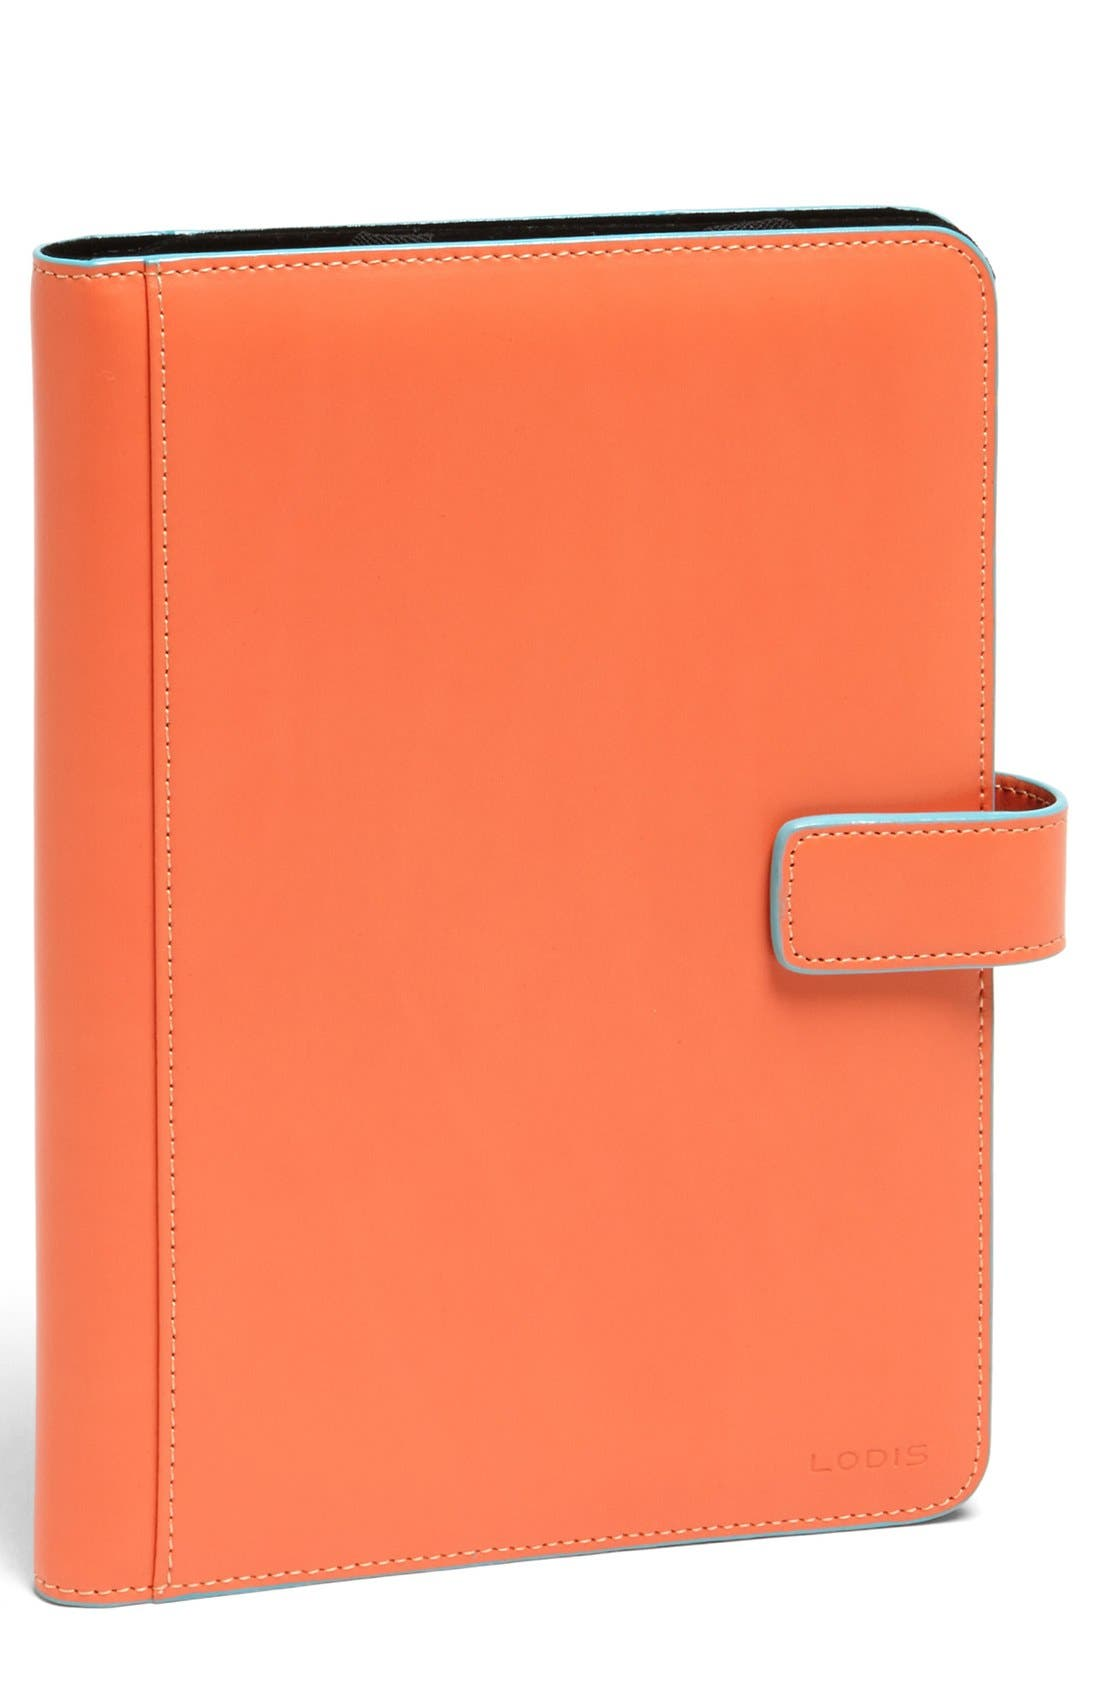 Alternate Image 1 Selected - Lodis 'Swivel' iPad mini Case